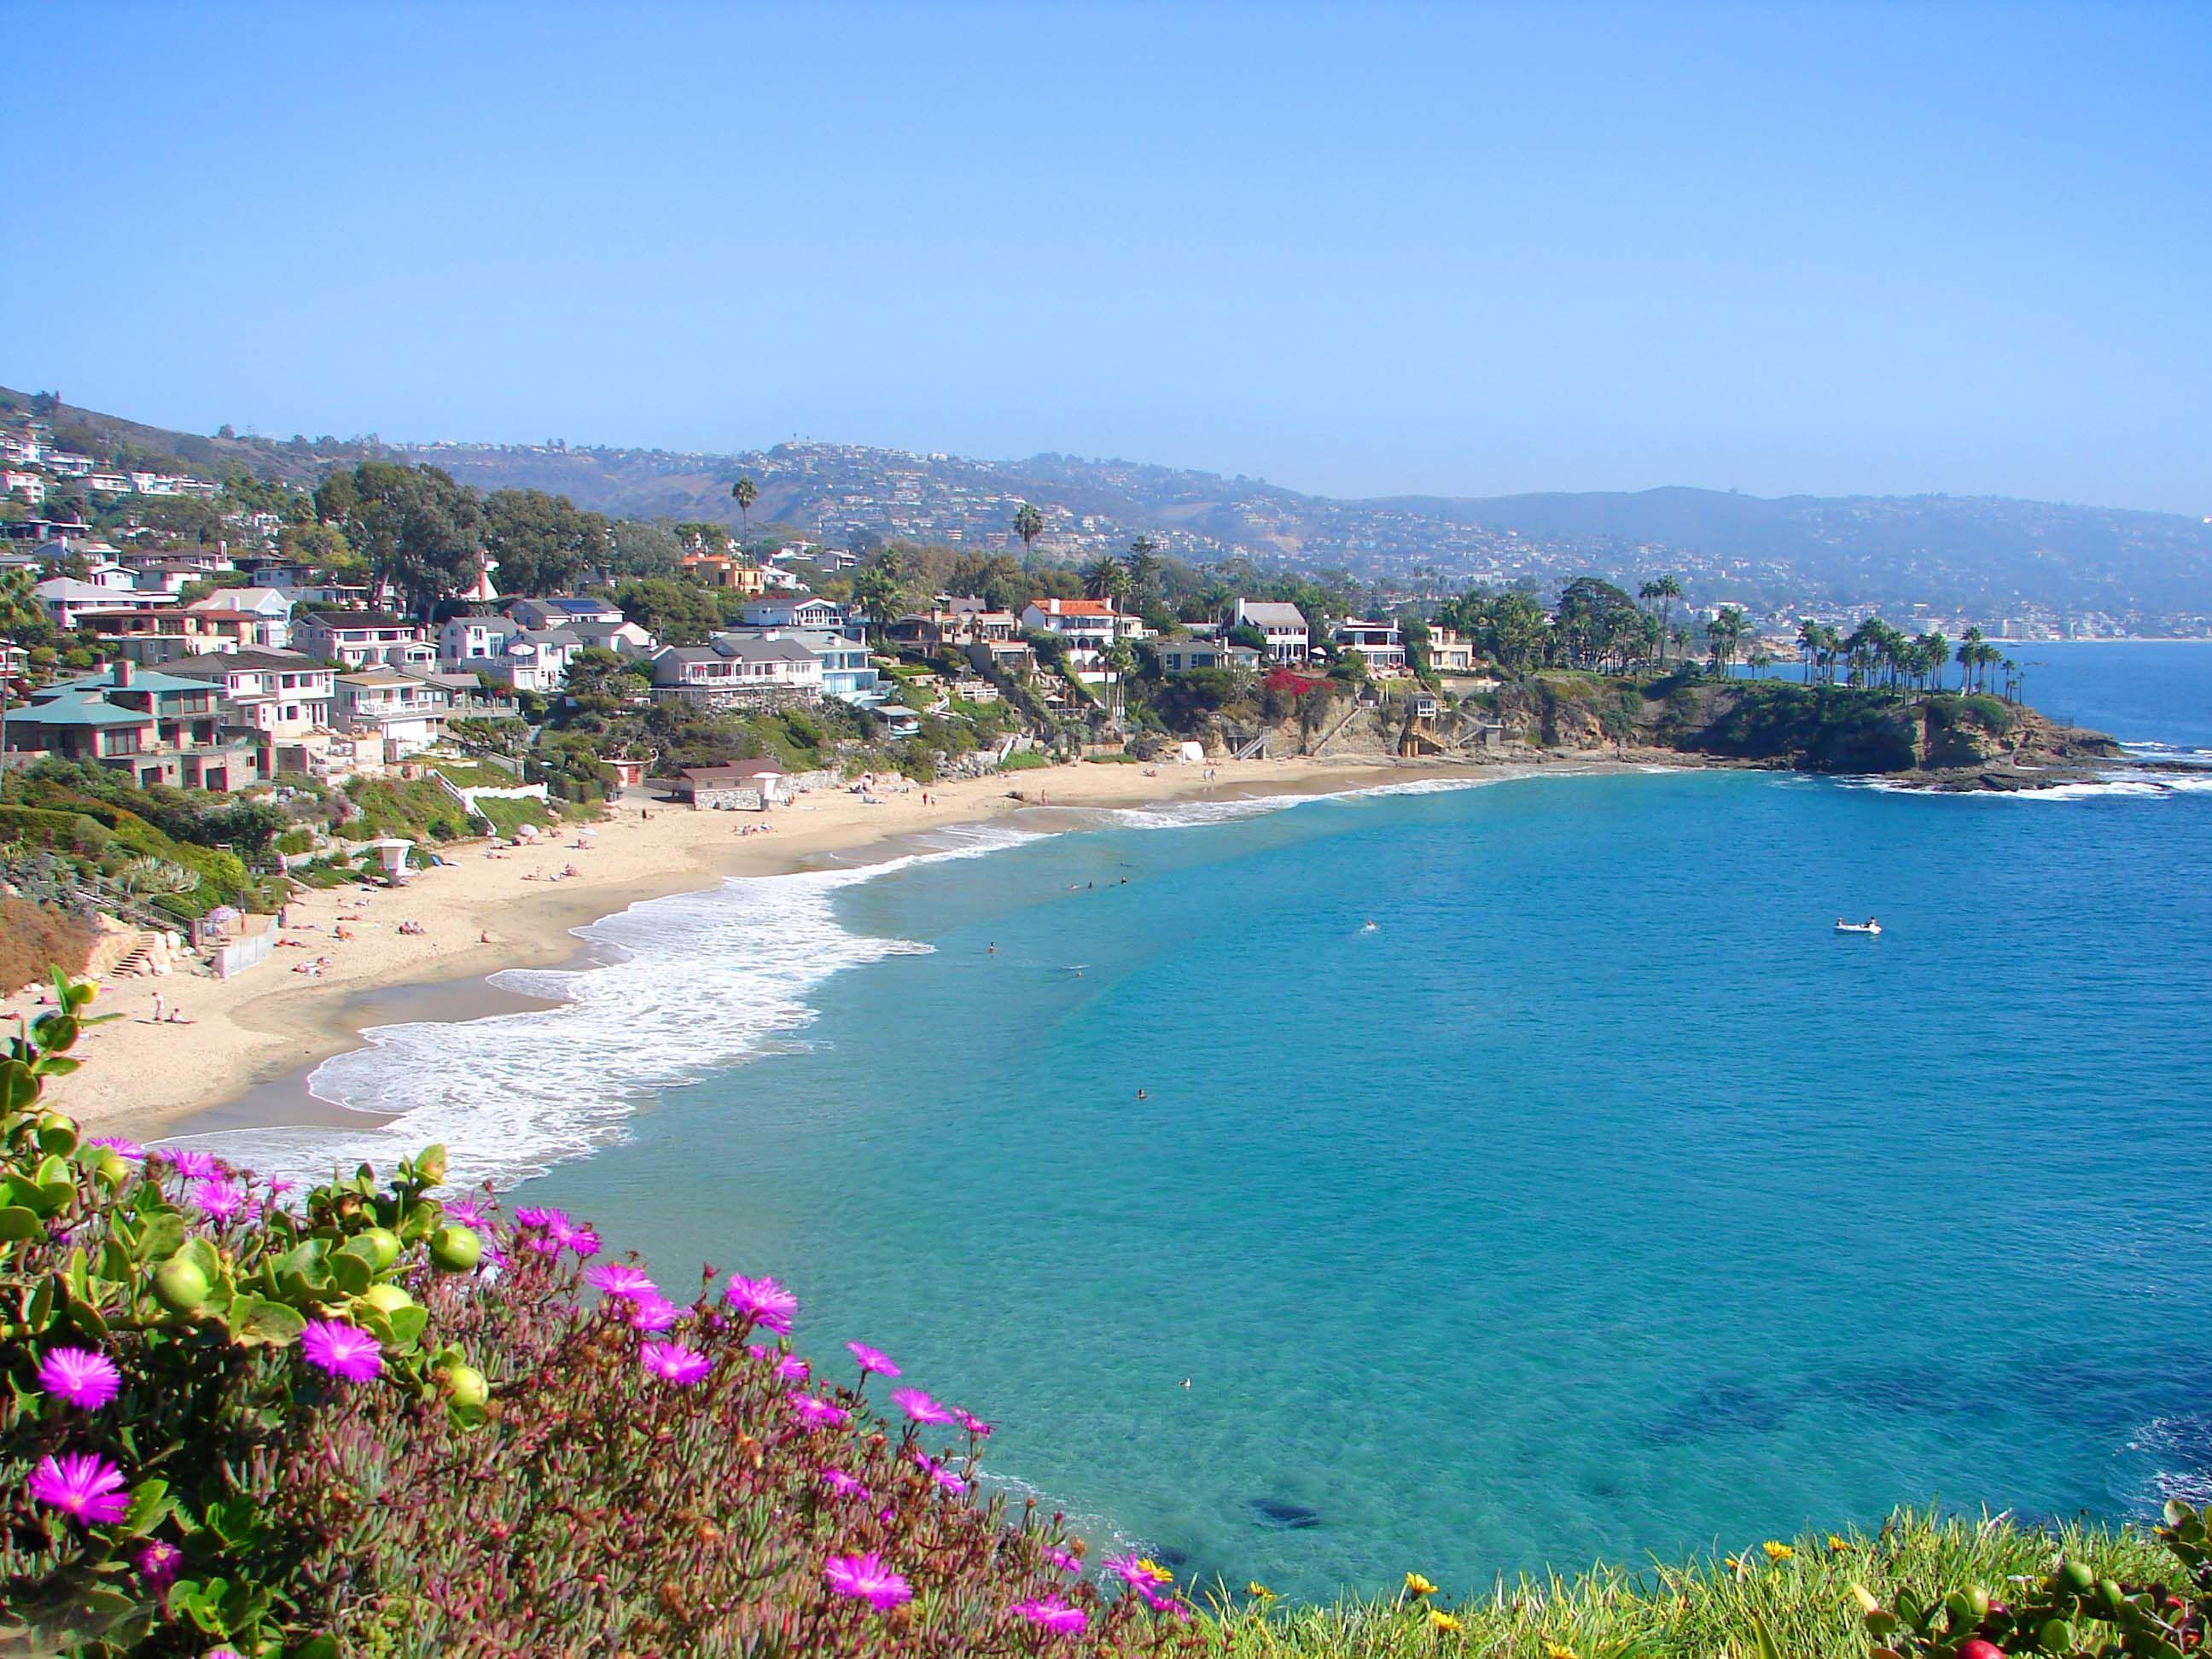 Outdoors In Newport Beach California